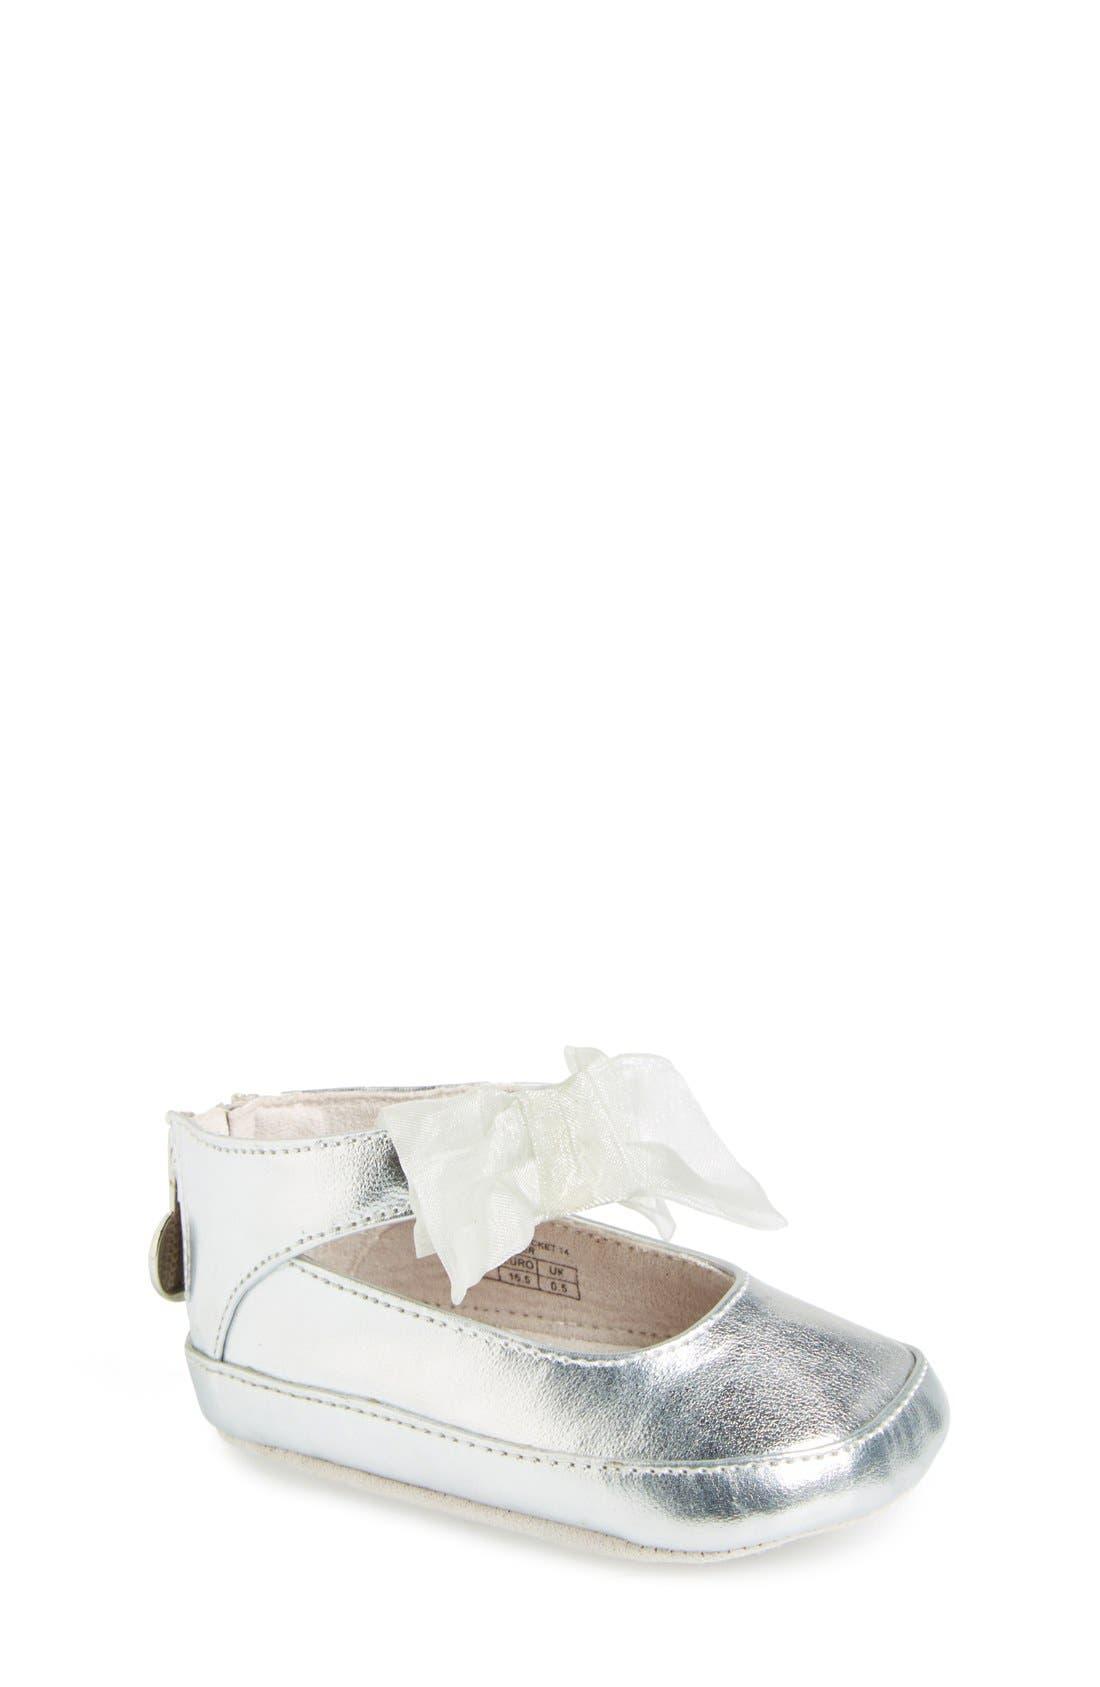 'Baby Nantucket' Crib Shoe,                             Main thumbnail 1, color,                             Silver